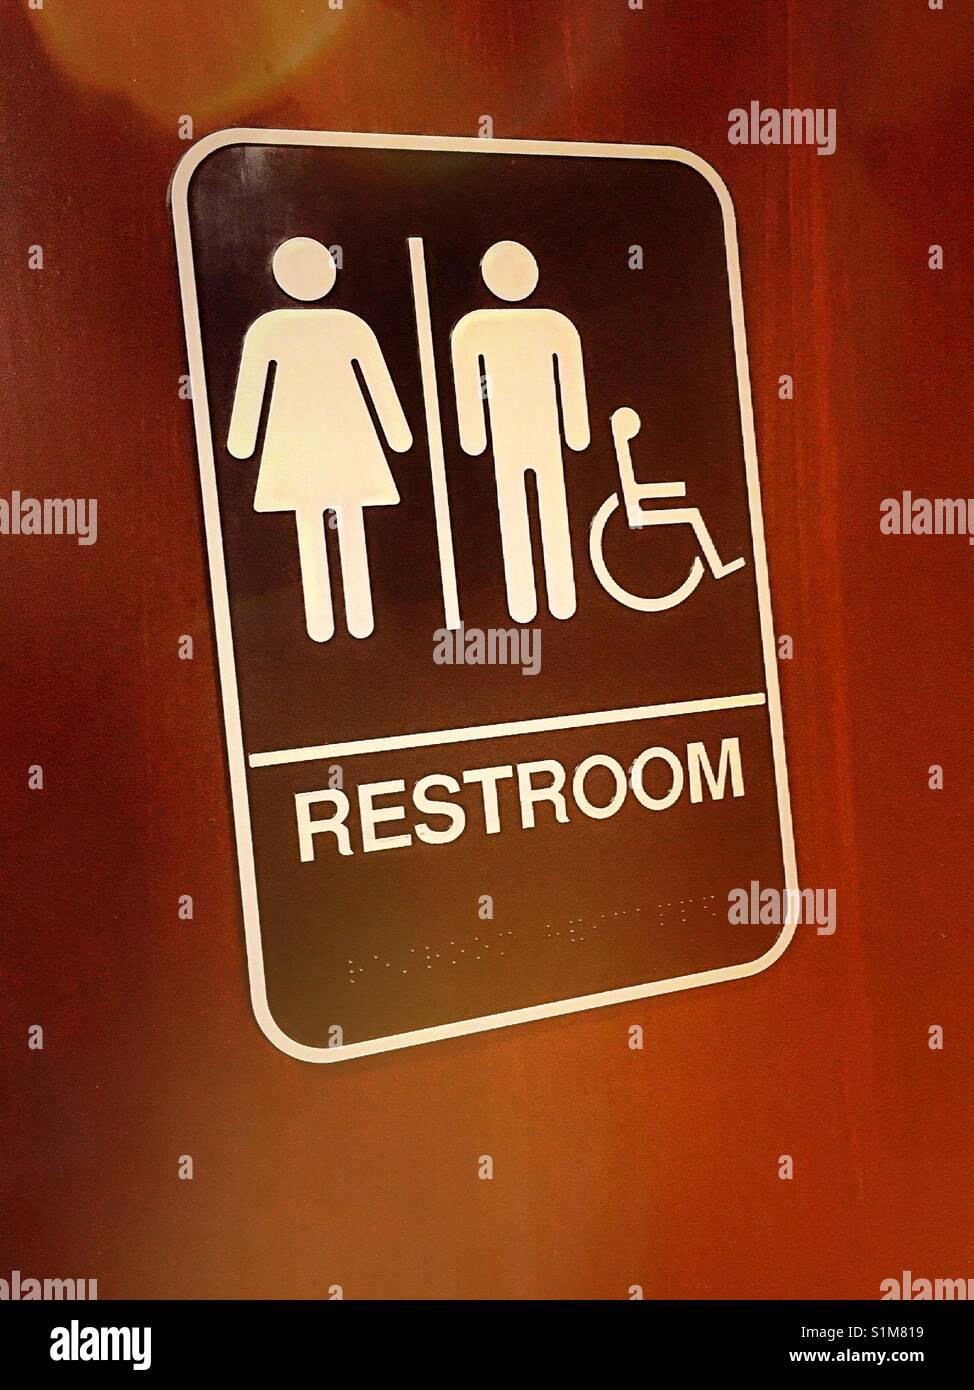 Wheelchair Accessible Ada Stock Photos Wheelchair Accessible Ada - Unisex handicap bathroom sign